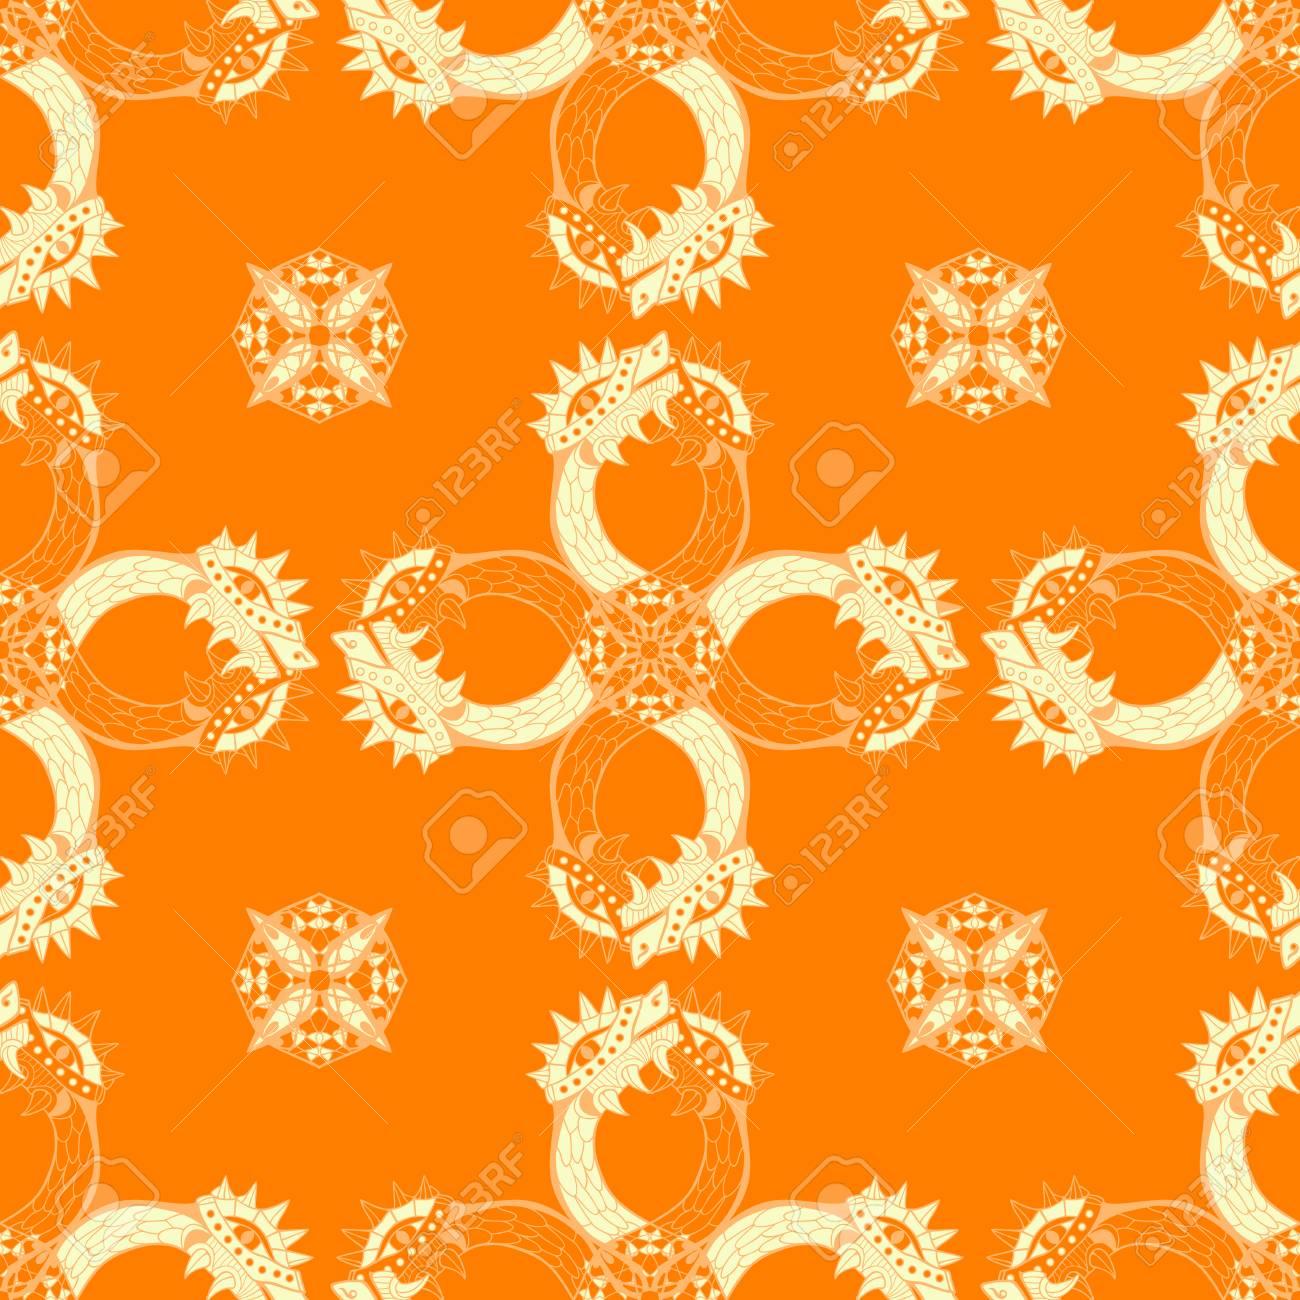 Gold heads of dragon. Circle ornamental seamless pattern. Vector illustration. - 95627775